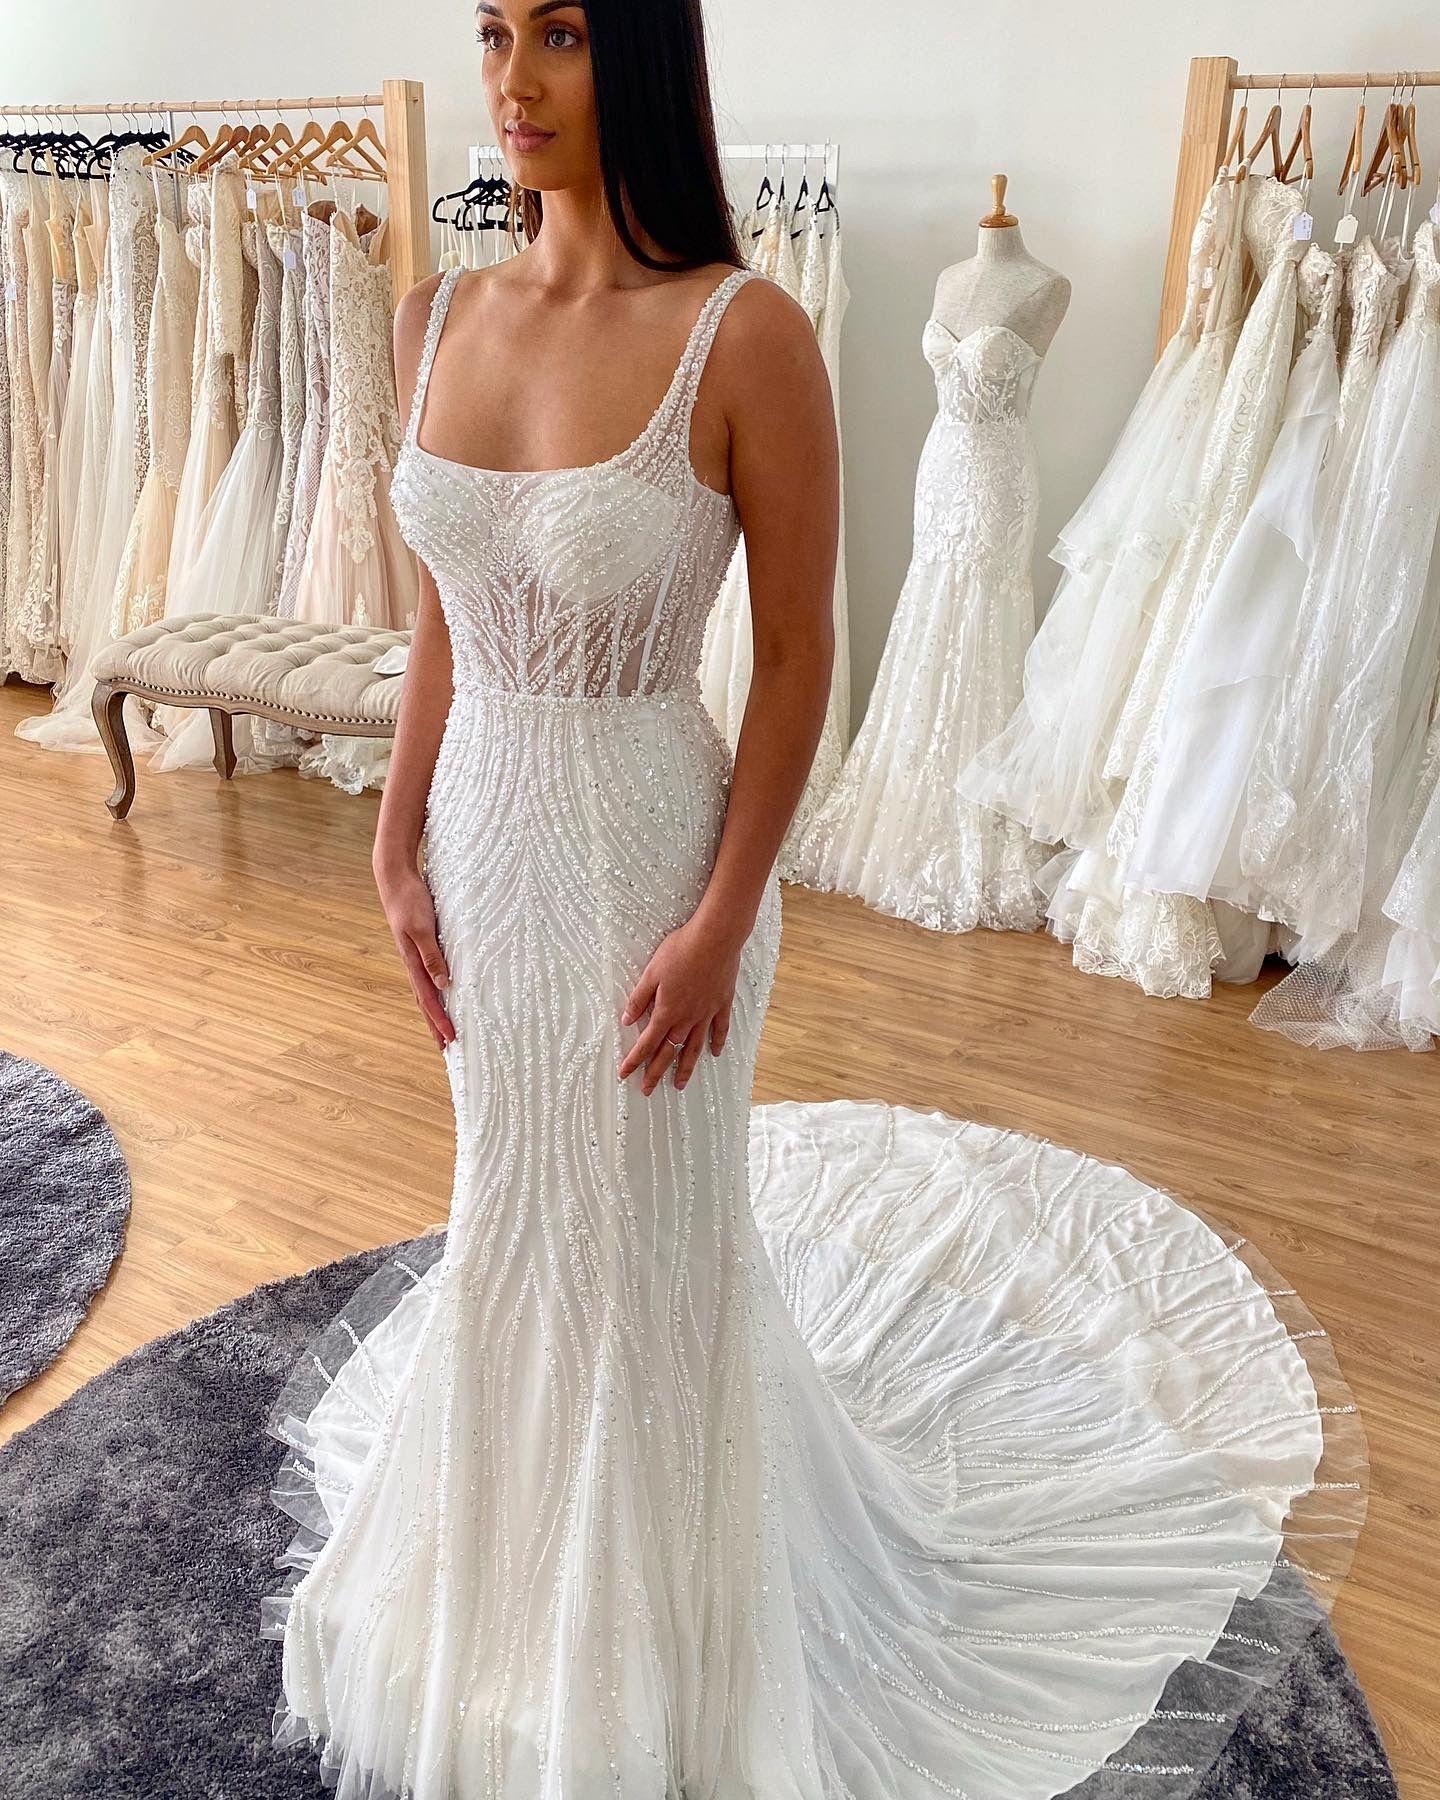 Square Neck Fitted Mermaid Wedding Dress Full Beaded Corset Bodice 2020 2021 Perth Australia In 2021 Wedding Dresses Australia Wedding Dresses Wedding Dresses Beaded [ 1800 x 1440 Pixel ]